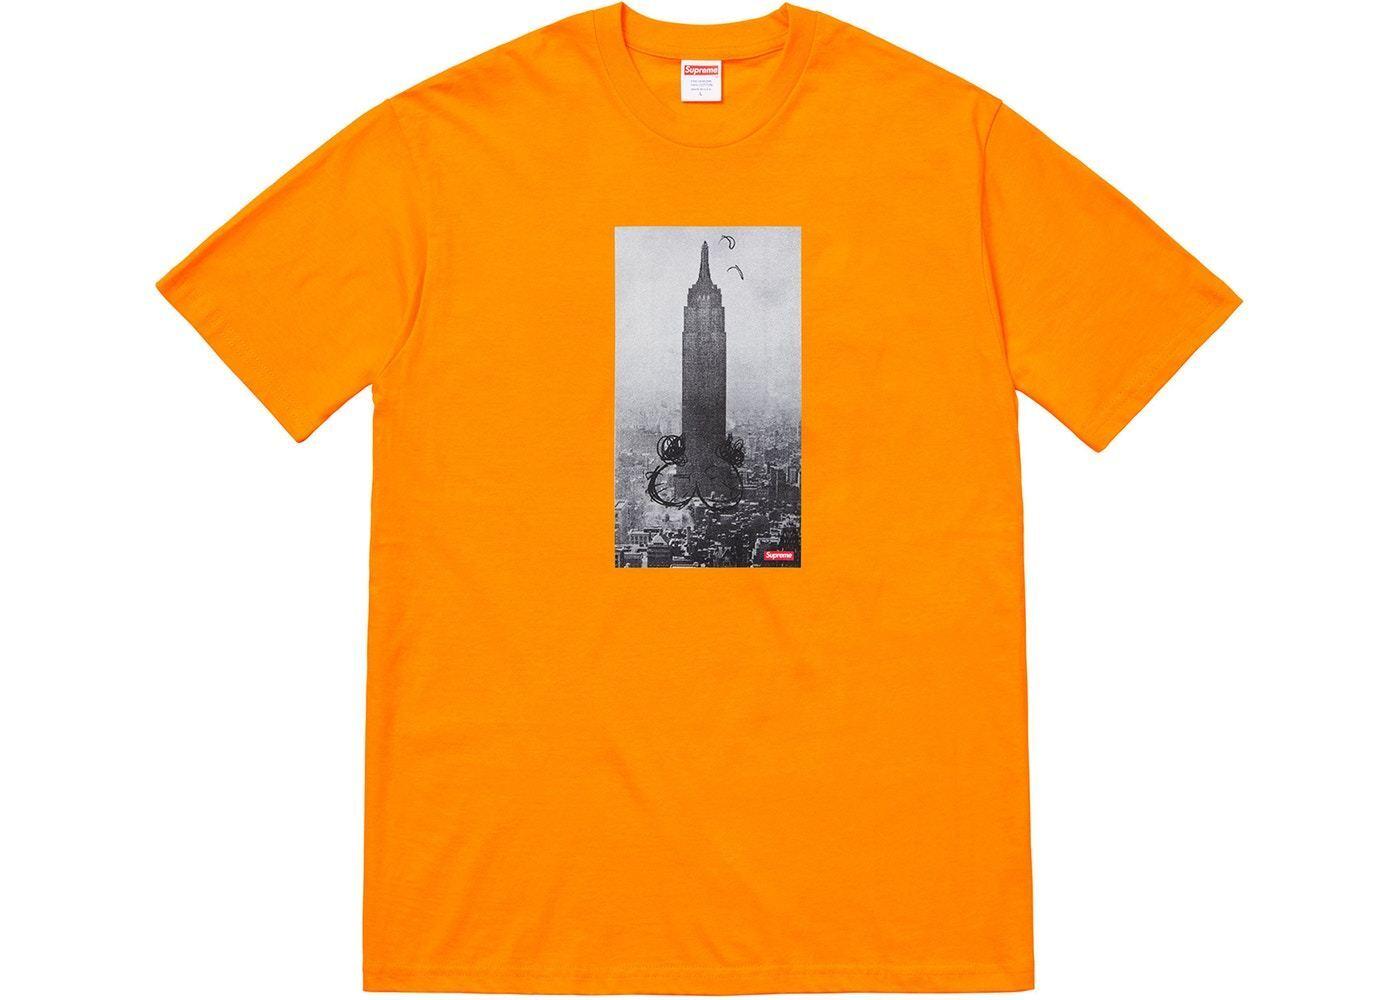 Supreme Mike Kelley The Empire State Building Tee orange FW18 Size Medium